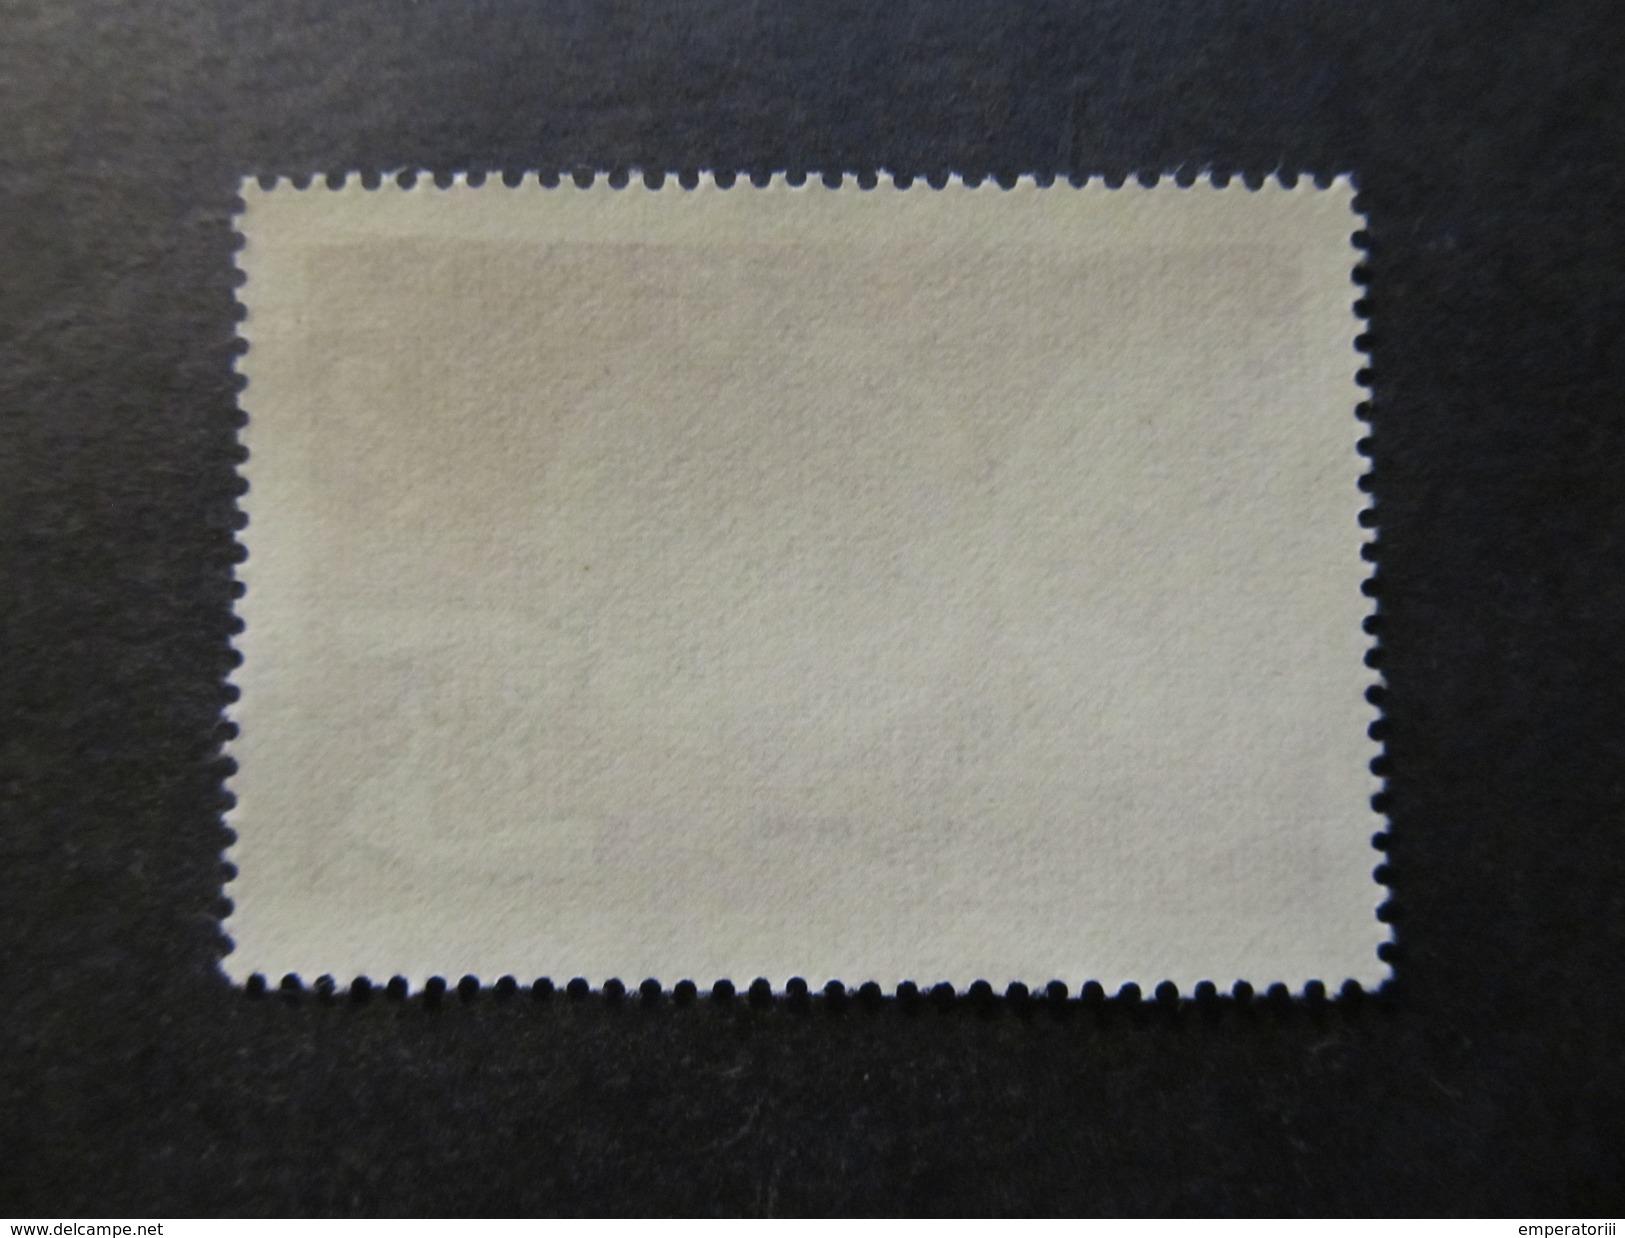 1969 - CHILE - ILO EMBLEM - SCOTT C296 A197 2E (2) - Chile